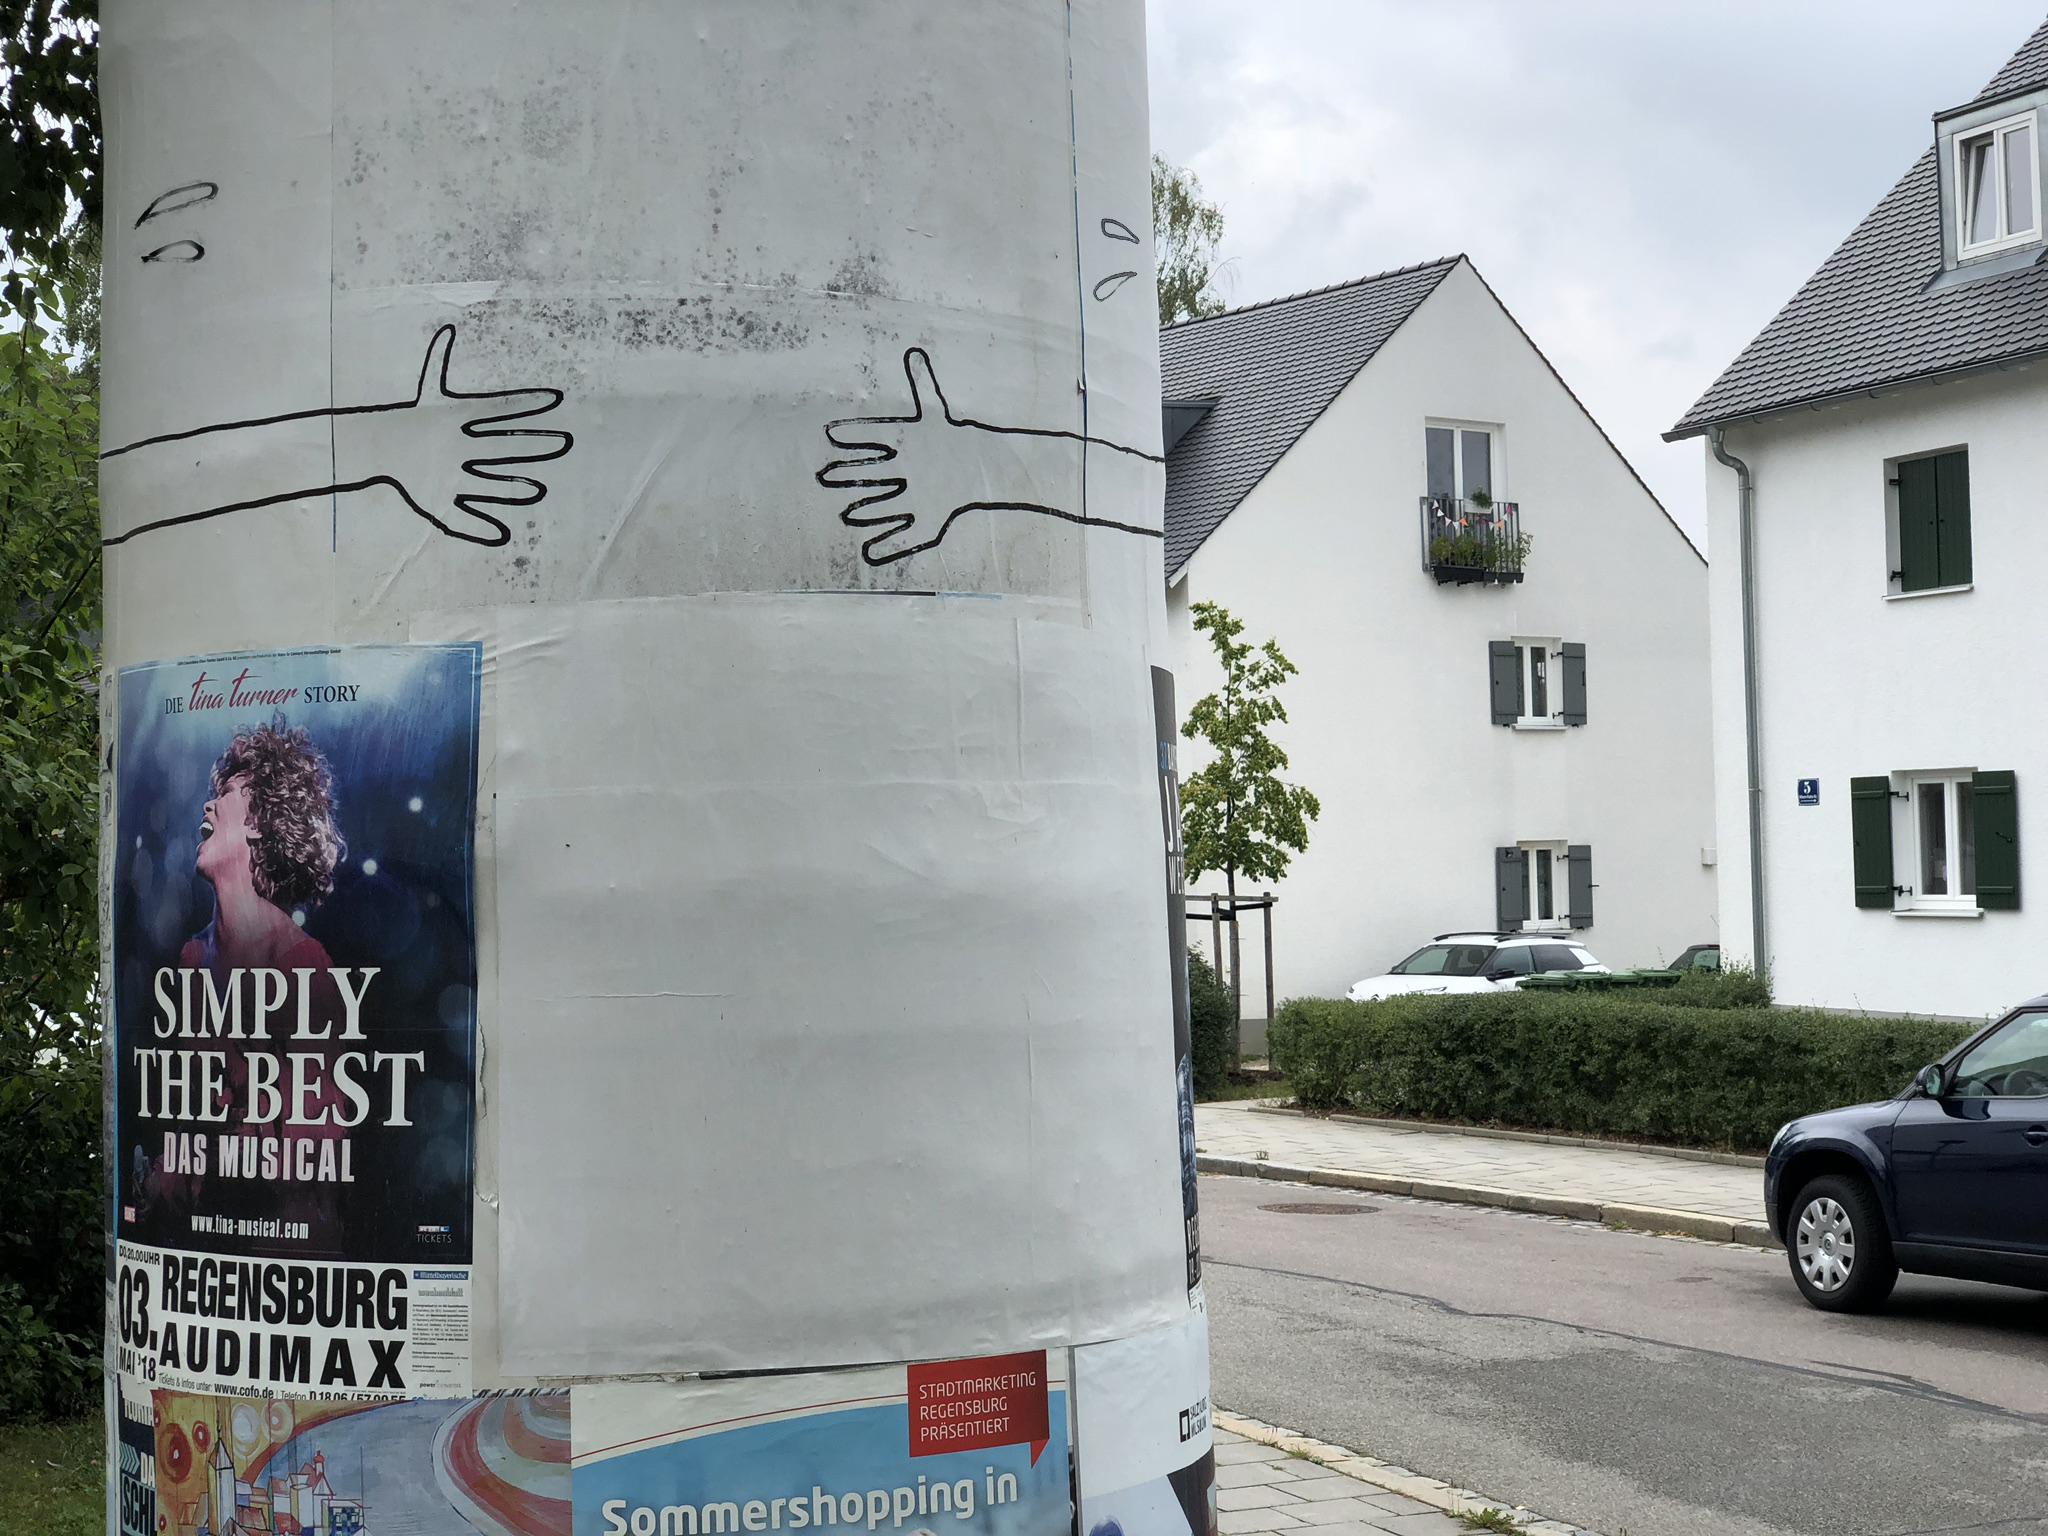 Regensburg, Germany, 2018